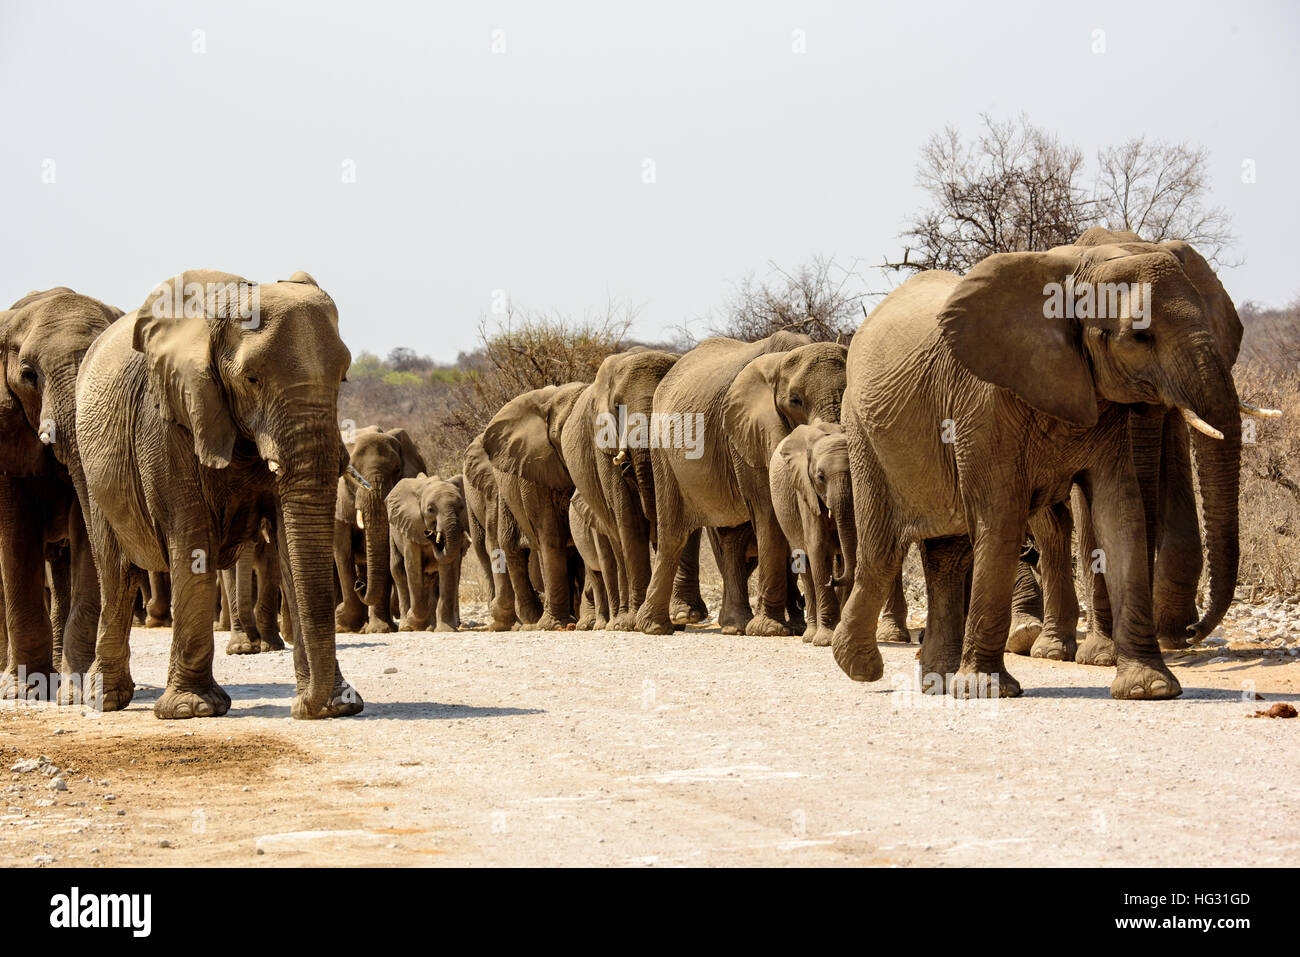 herd of elephants approaching - Stock Image